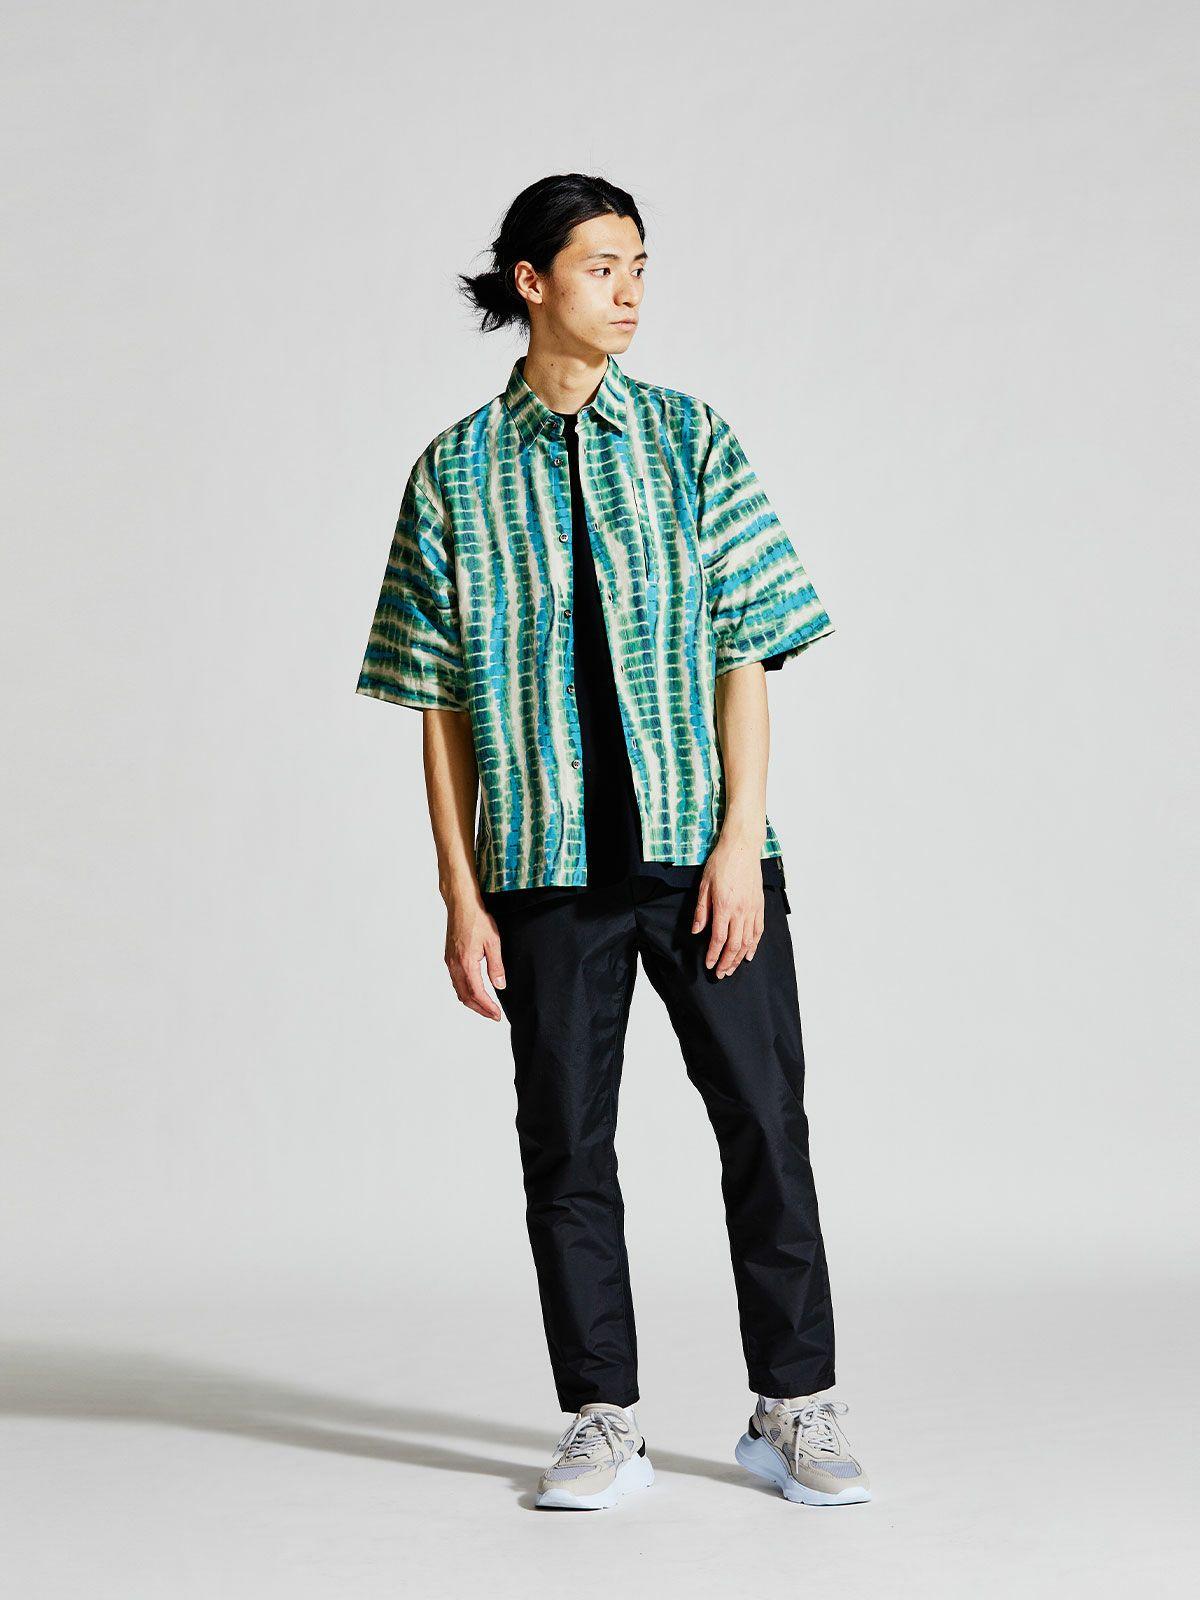 MIDIUMISOLID Men's タイダイライクプリントシャツ